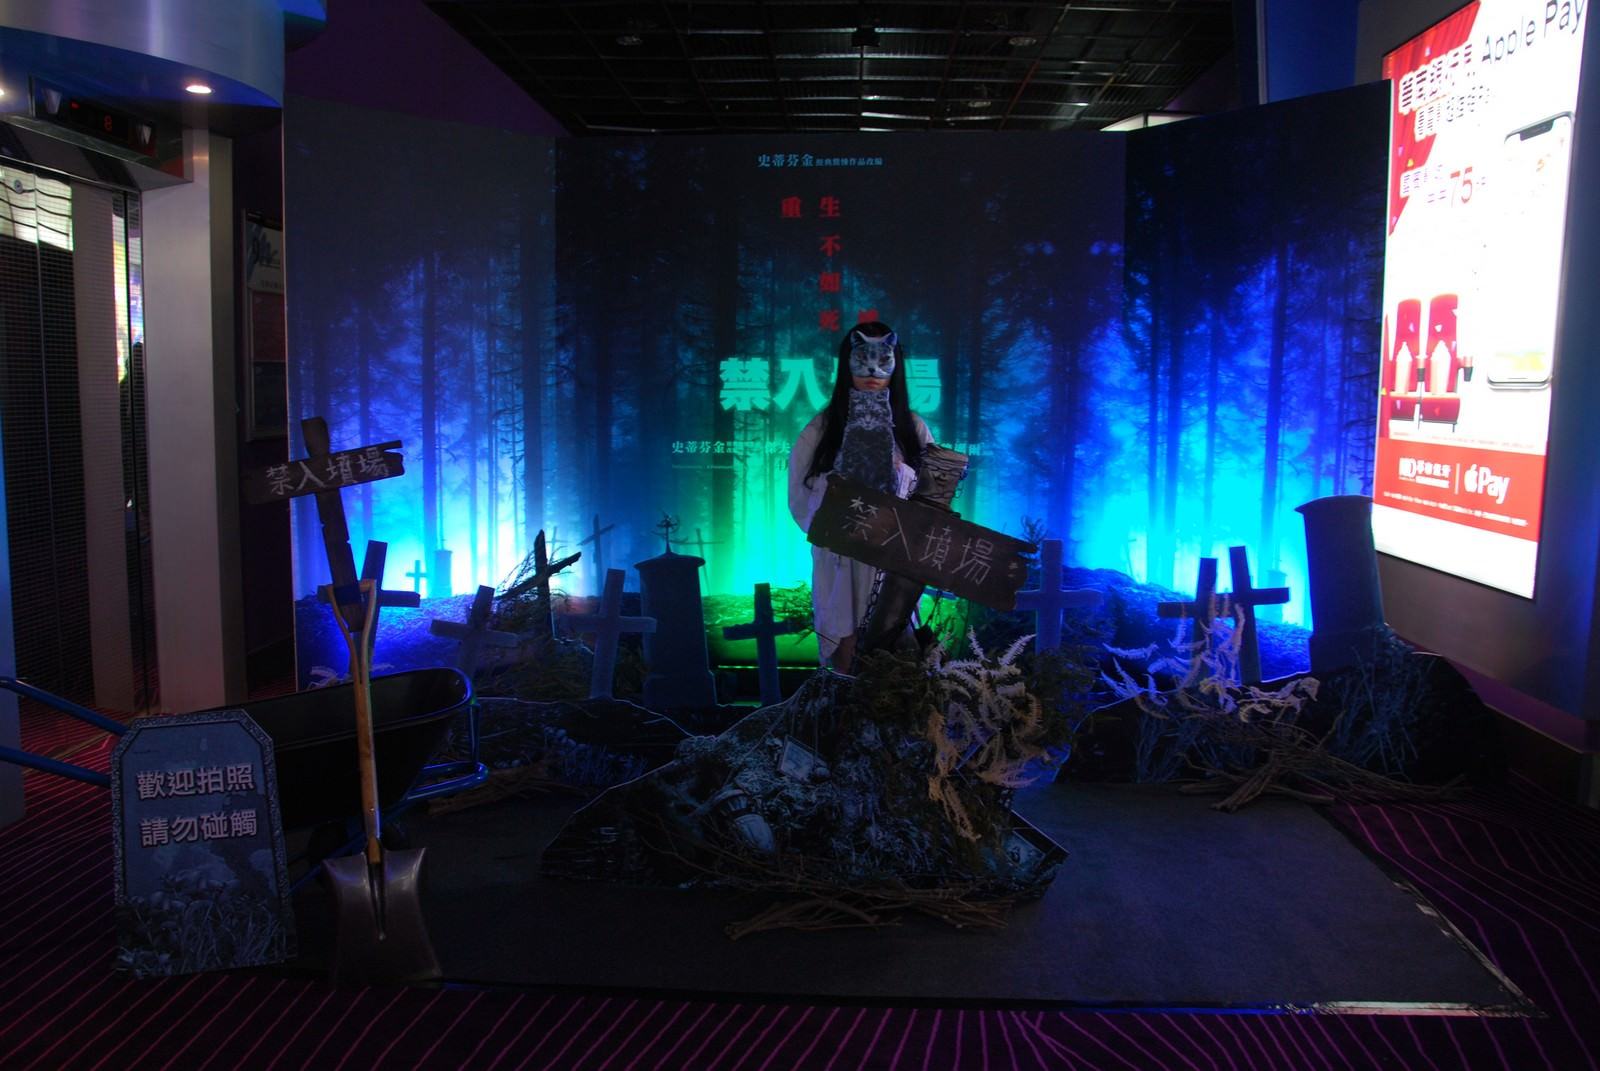 Movie, Pet Sematary(美國, 2019年) / 禁入墳場(台灣) / 詭墓(香港) / 宠物坟场(網路), 特映會現場